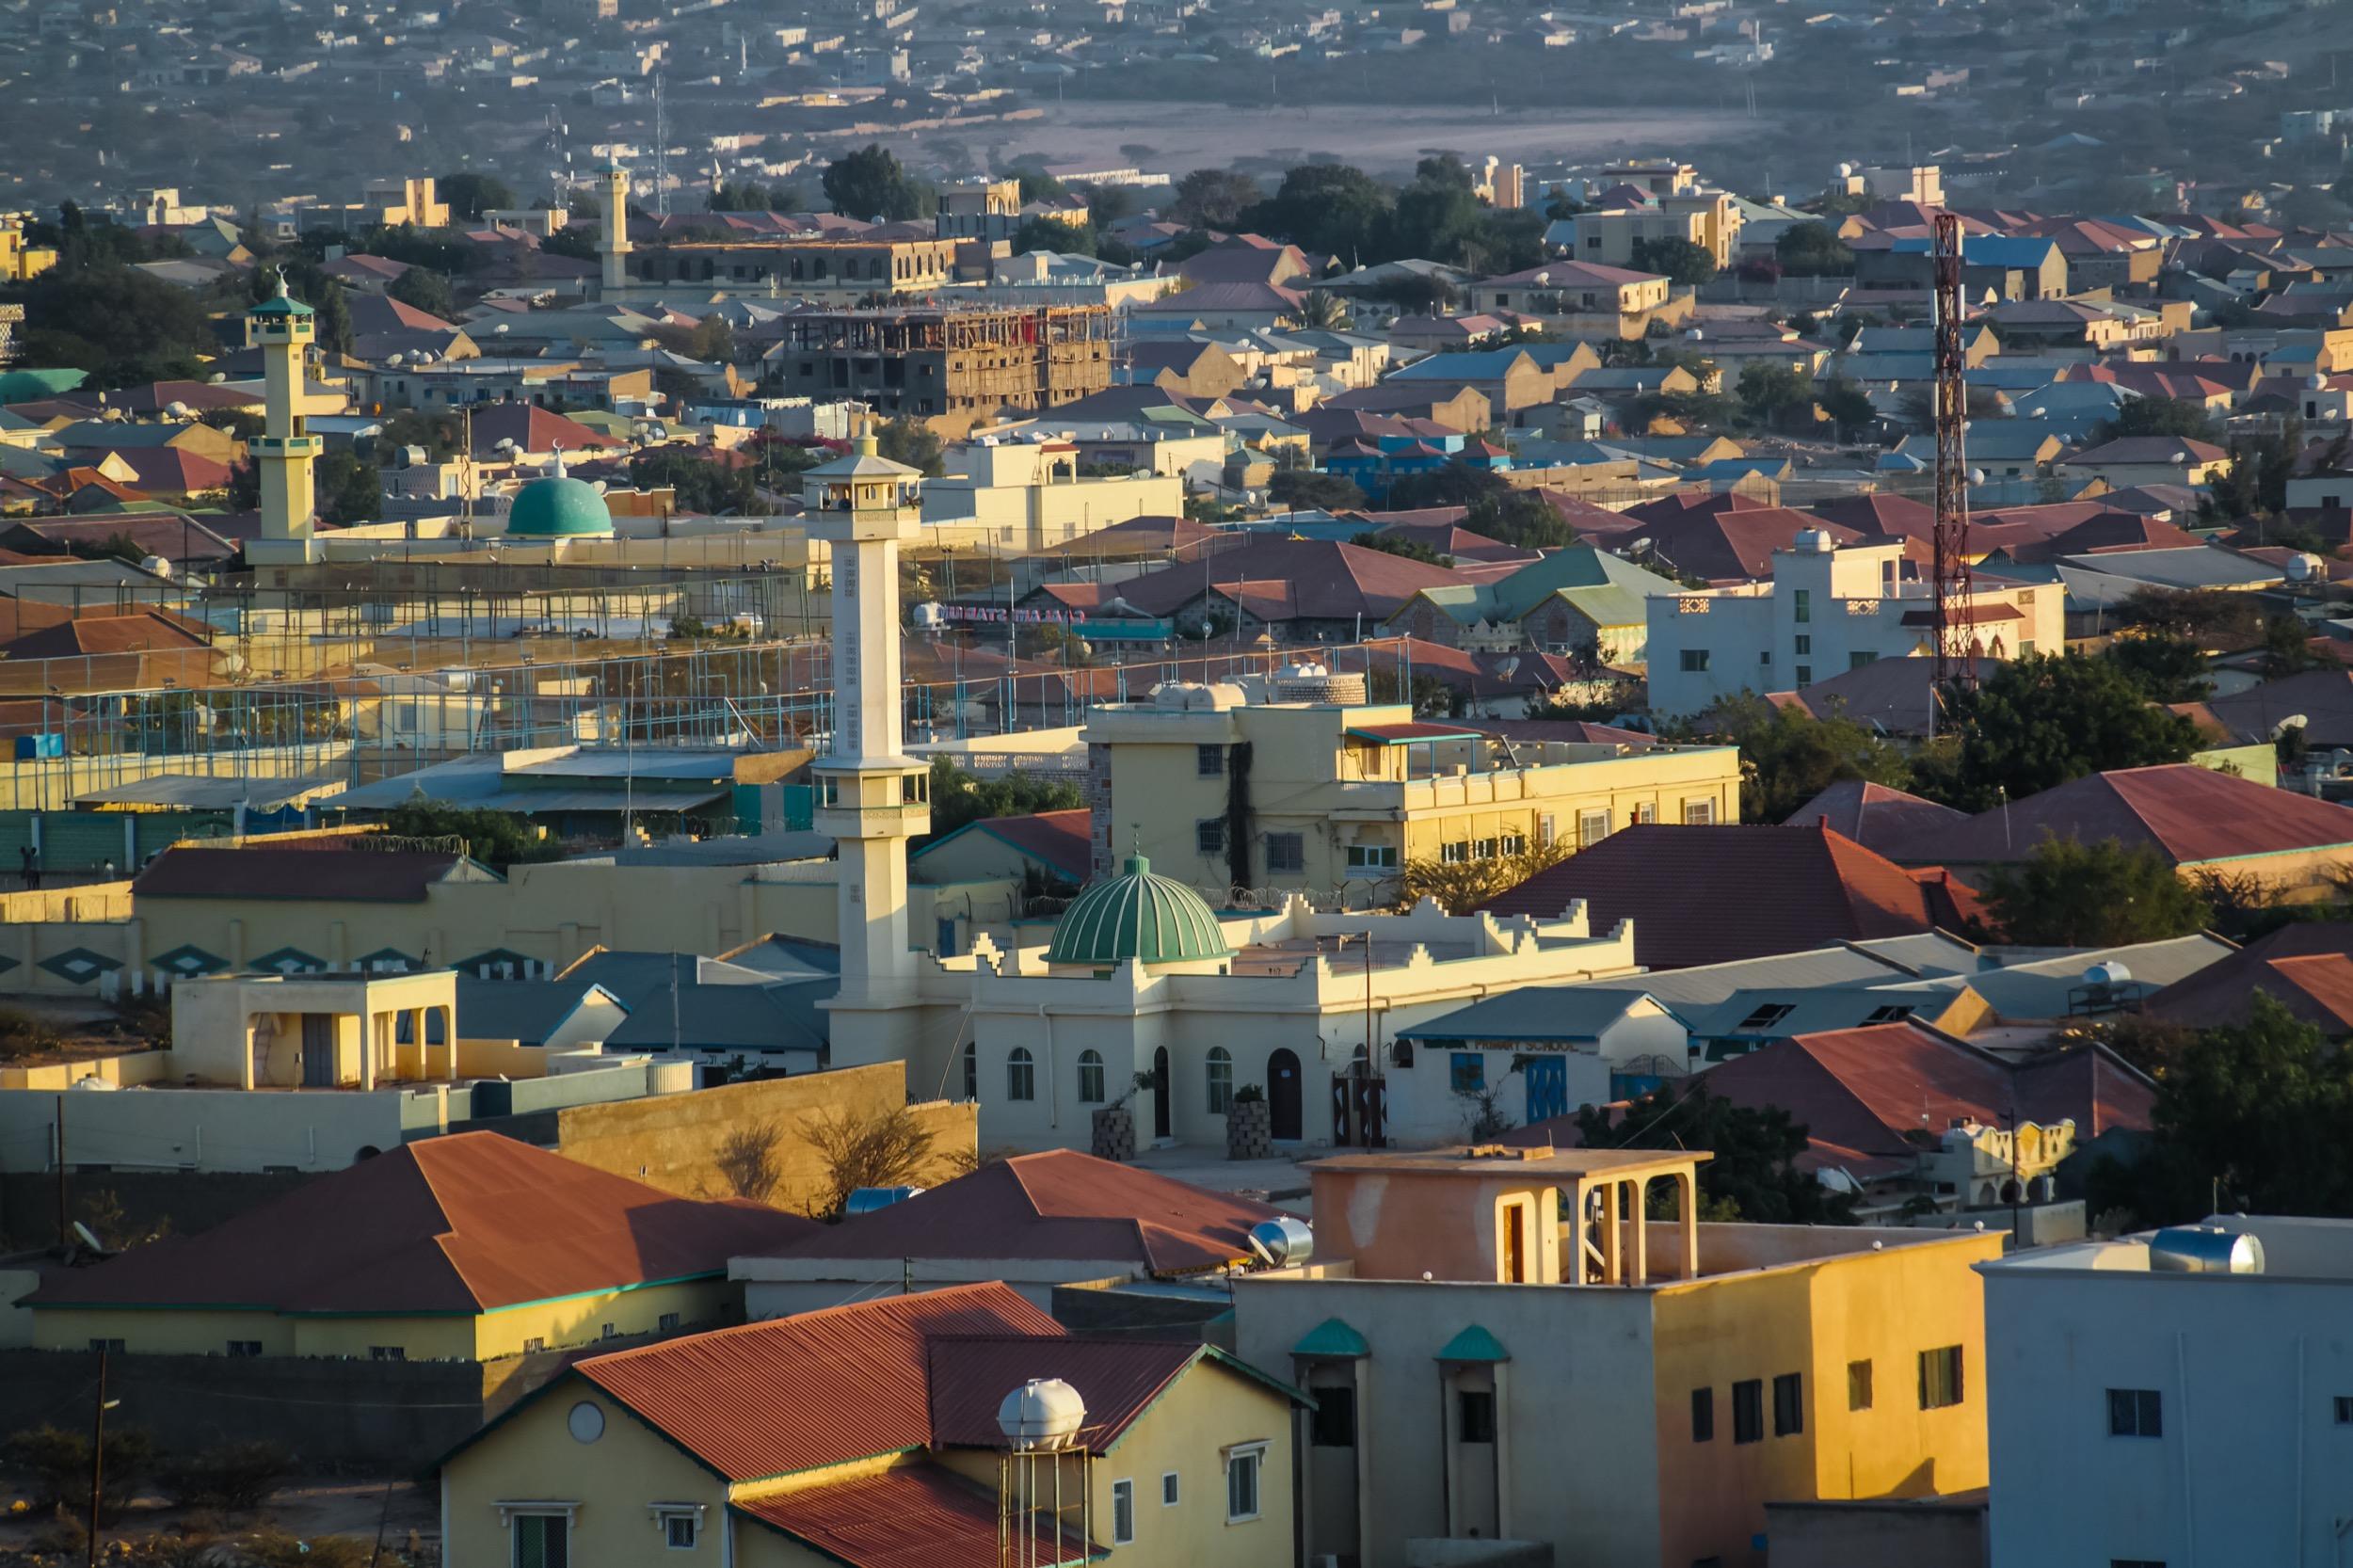 Henley Town Council - Boroma city in Somalia